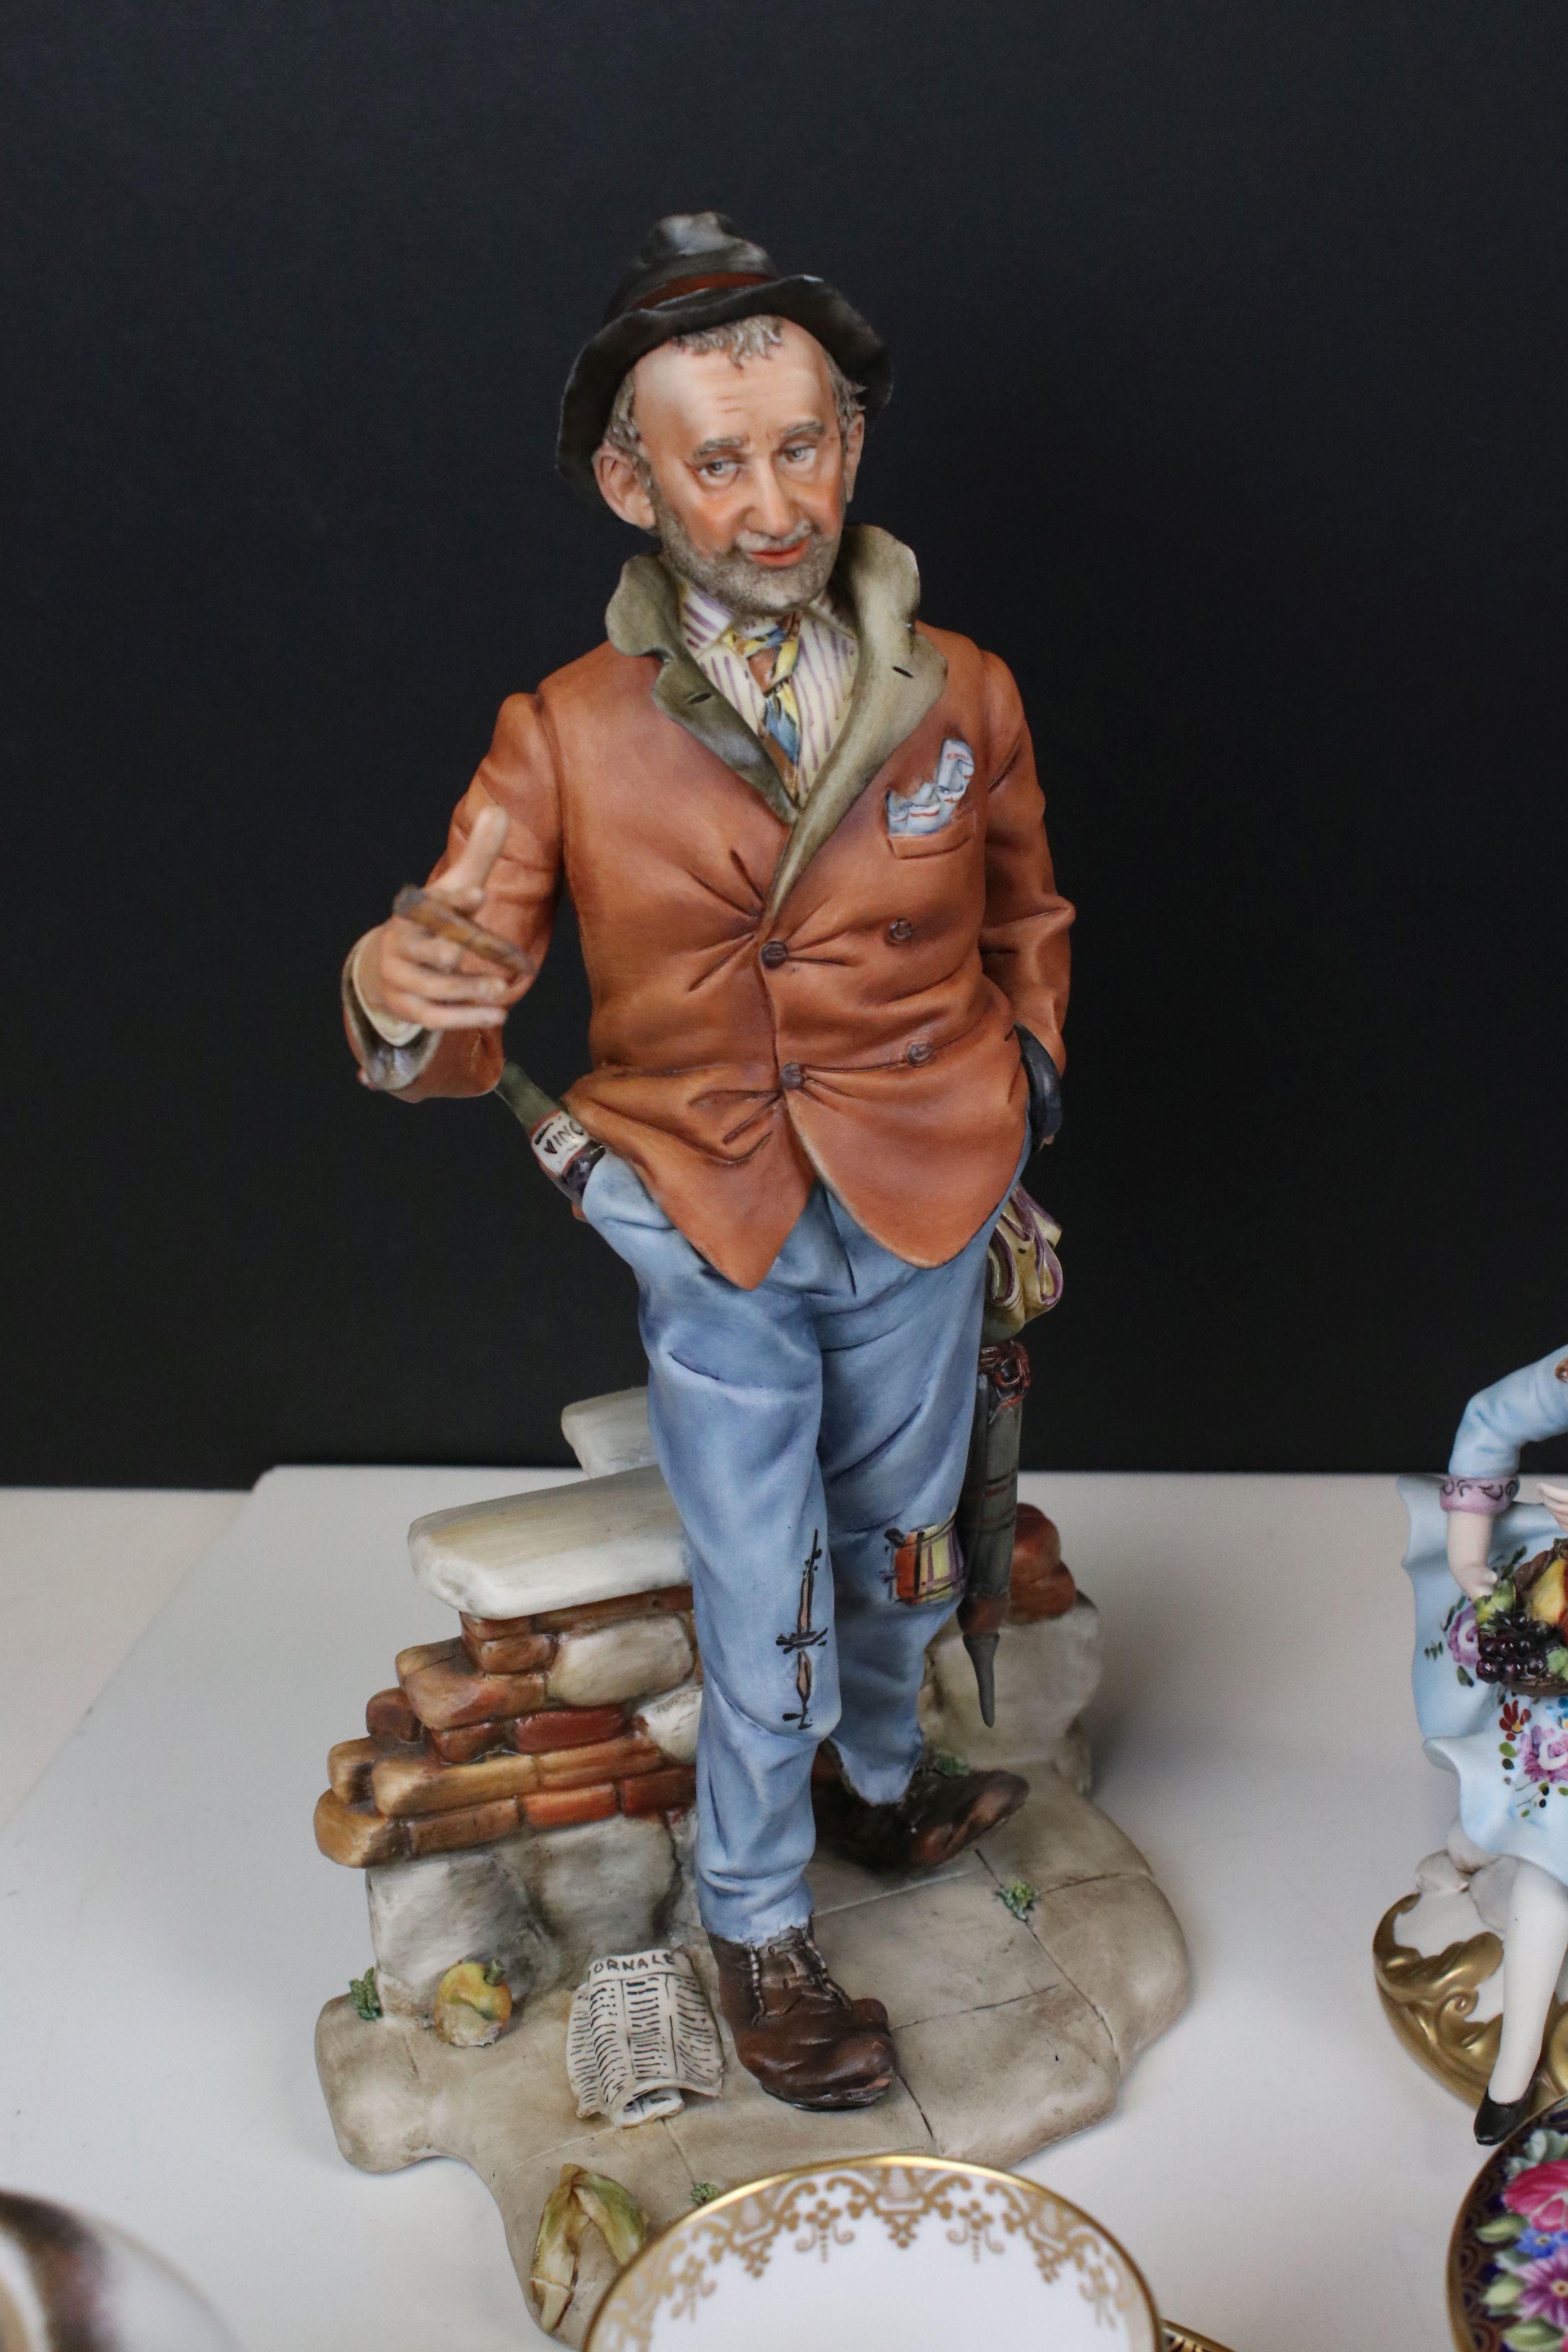 Mixed lot of Ceramics including Four Capodimonte Figures, Royal Doulton ' Diana ' Figurine, Spode - Image 7 of 7